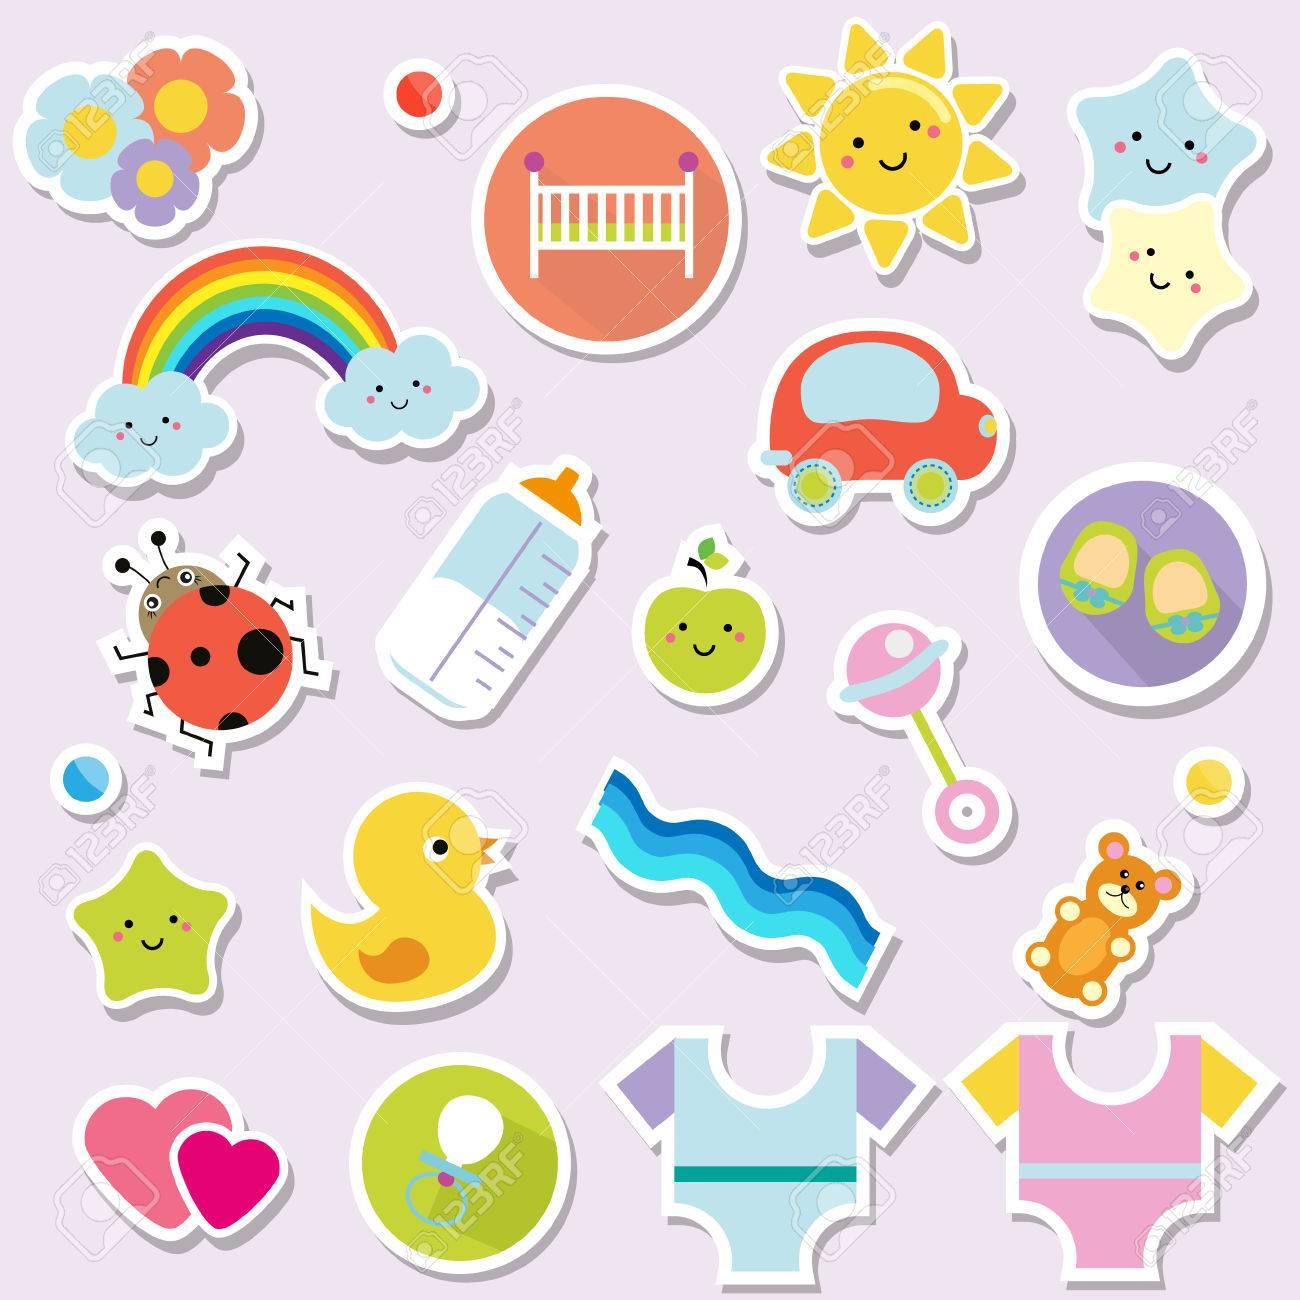 Baby Stickers Kids Children Design Elements For Scrapbook